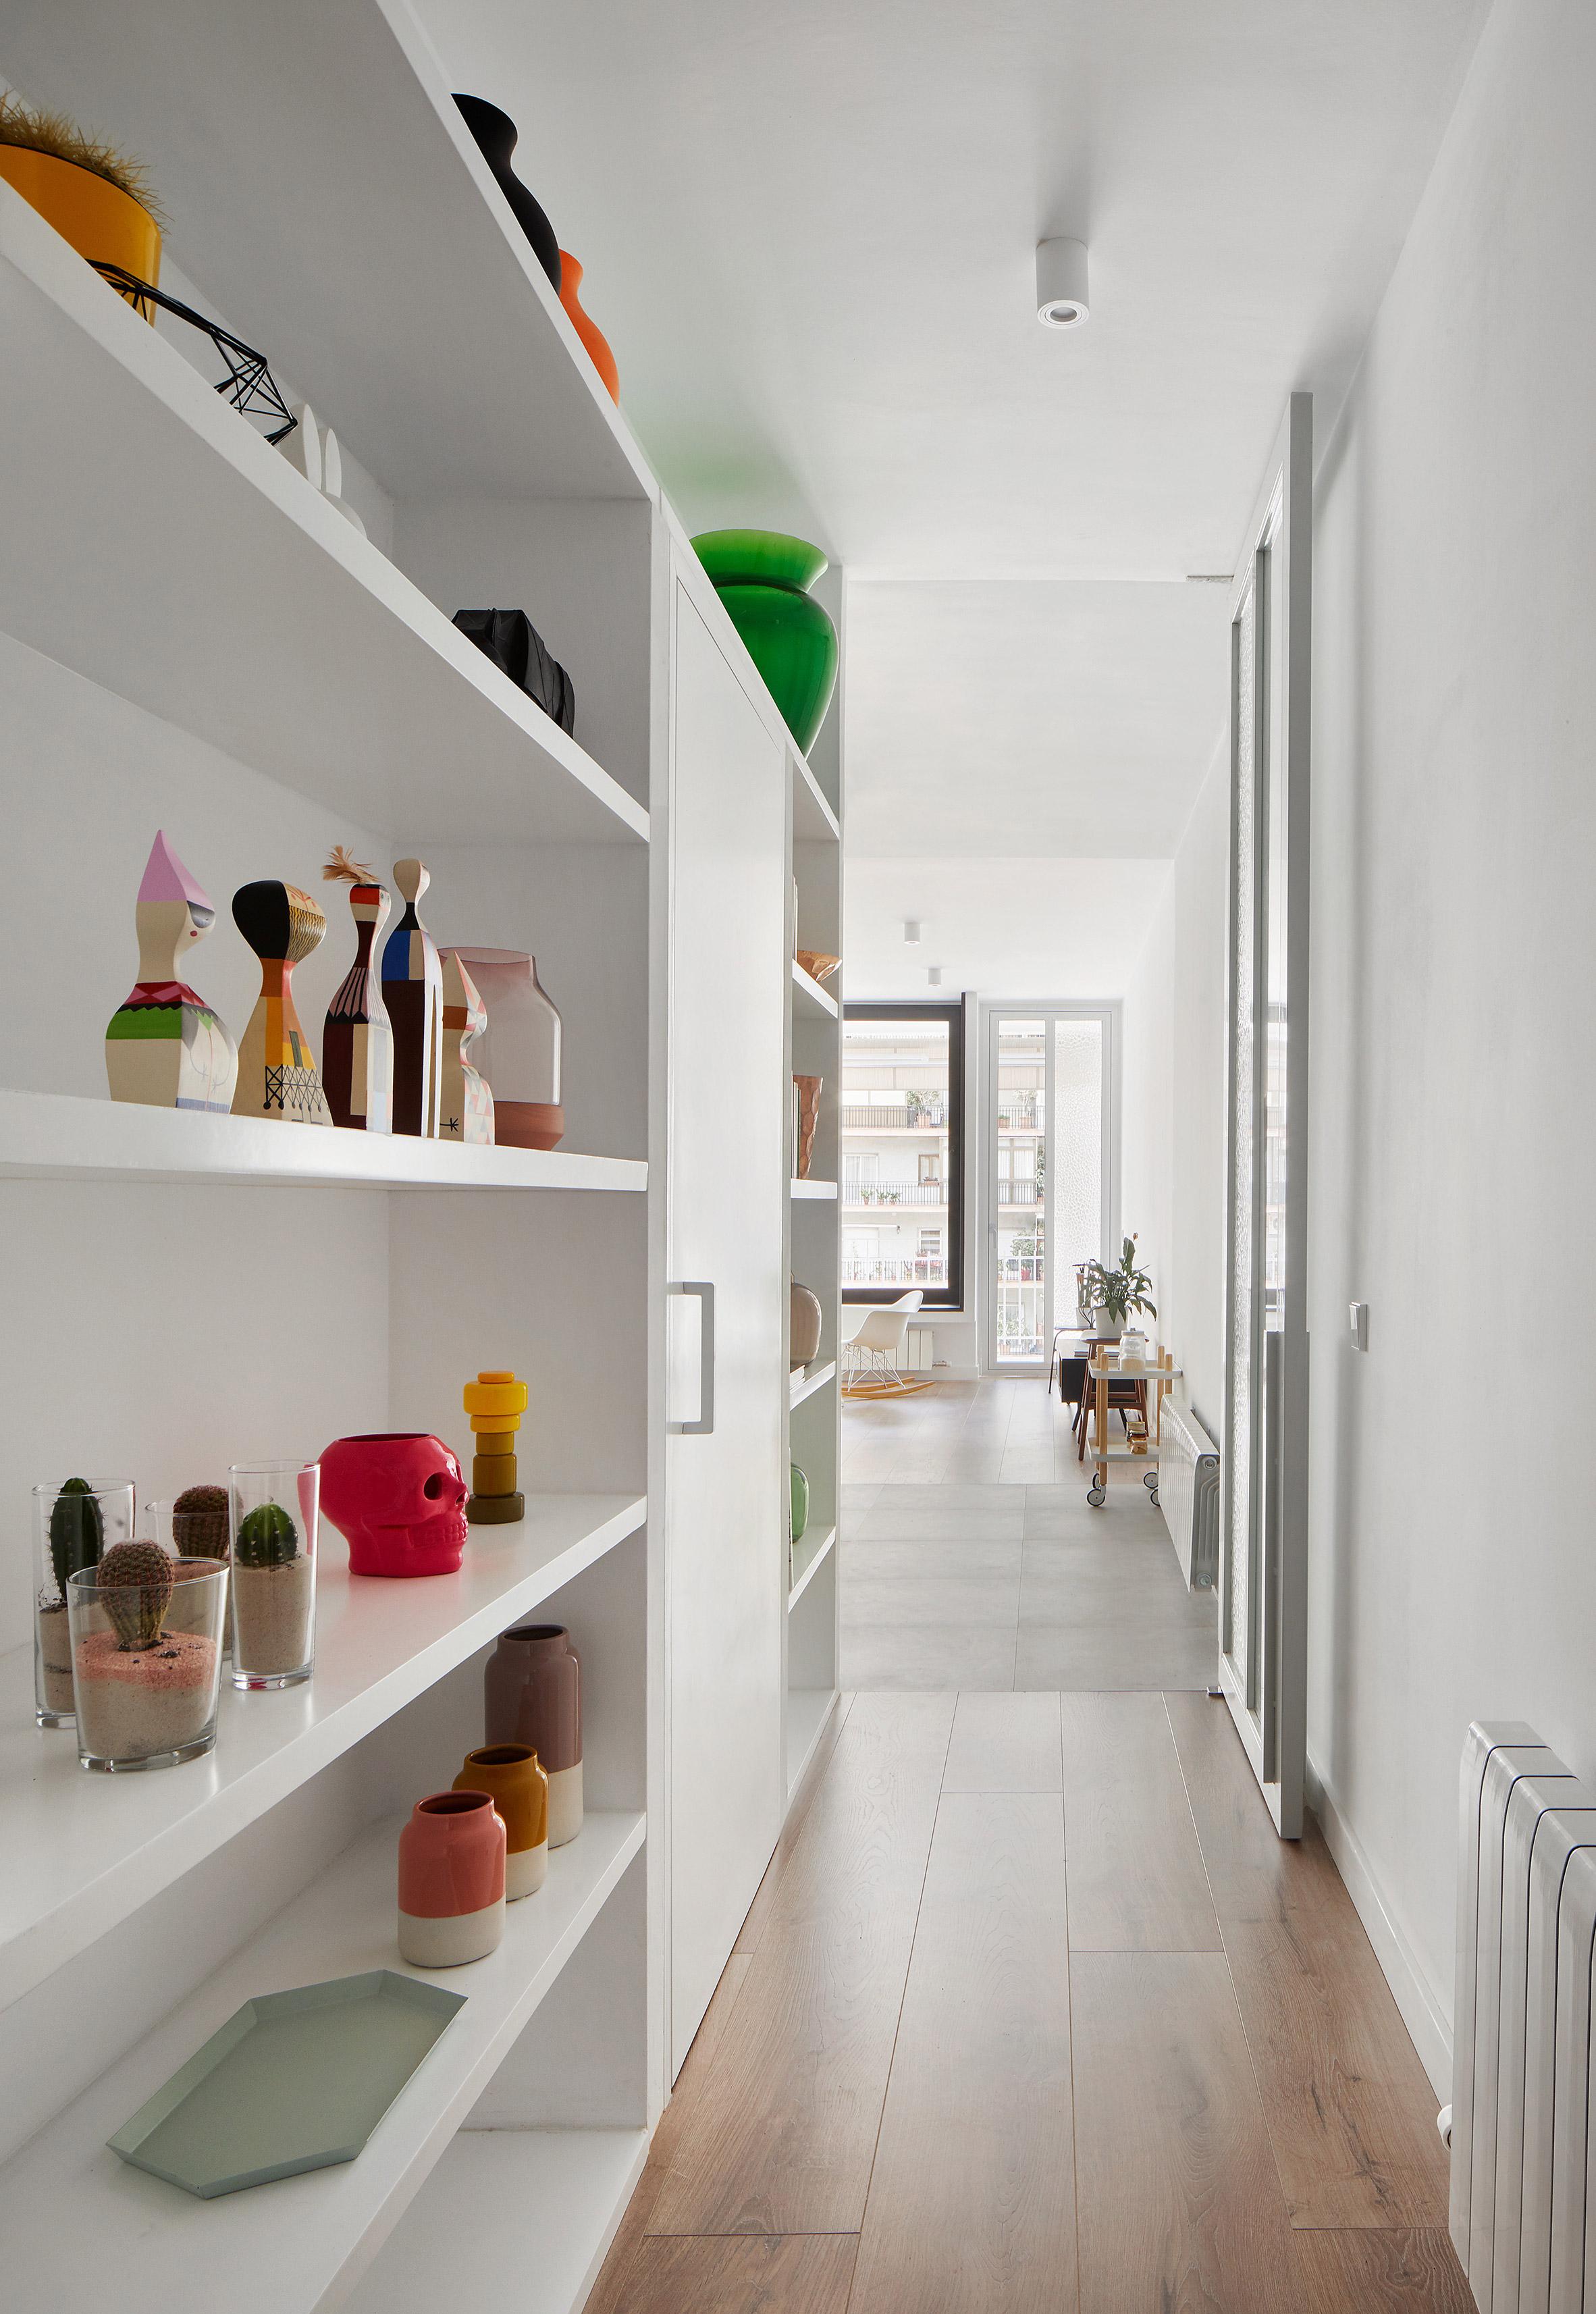 Raúl Sánchez Architects updates Barcelona flat with grey granite and bright white walls